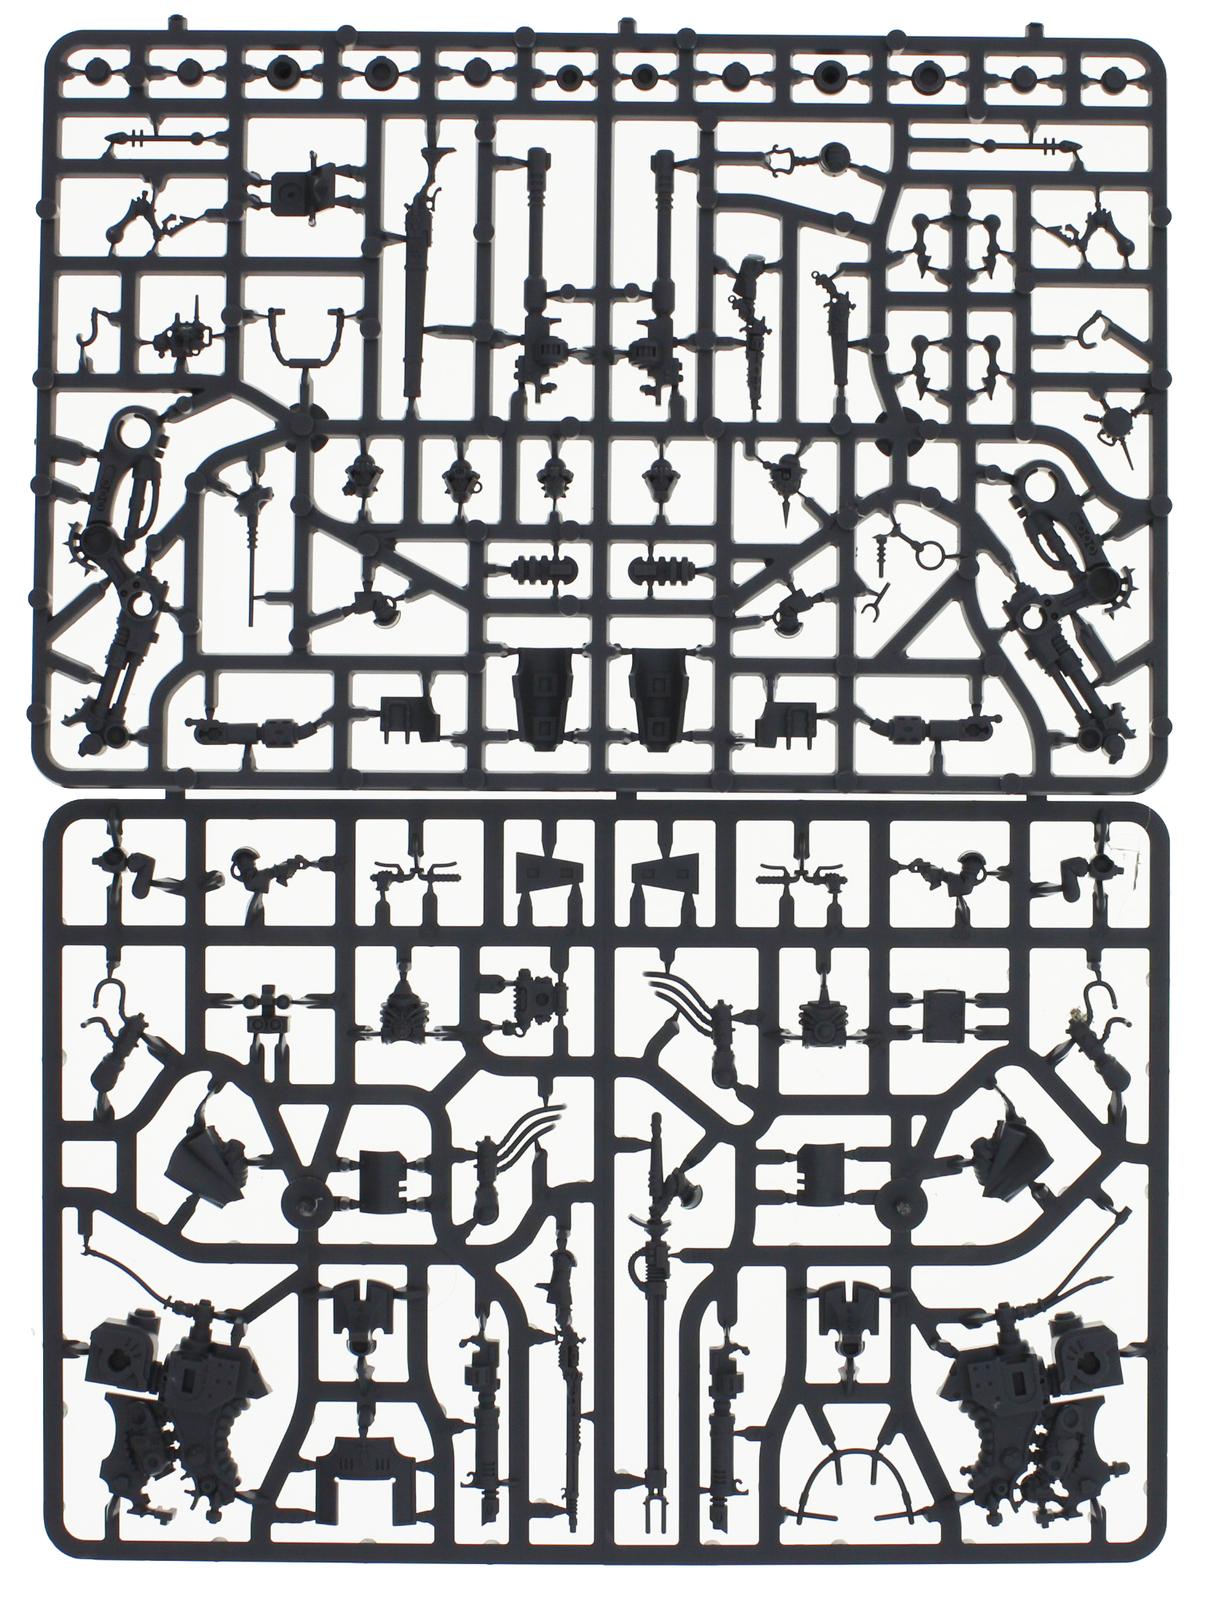 Warhammer 40,000 Adeptus Mechanicus Ironstrider image